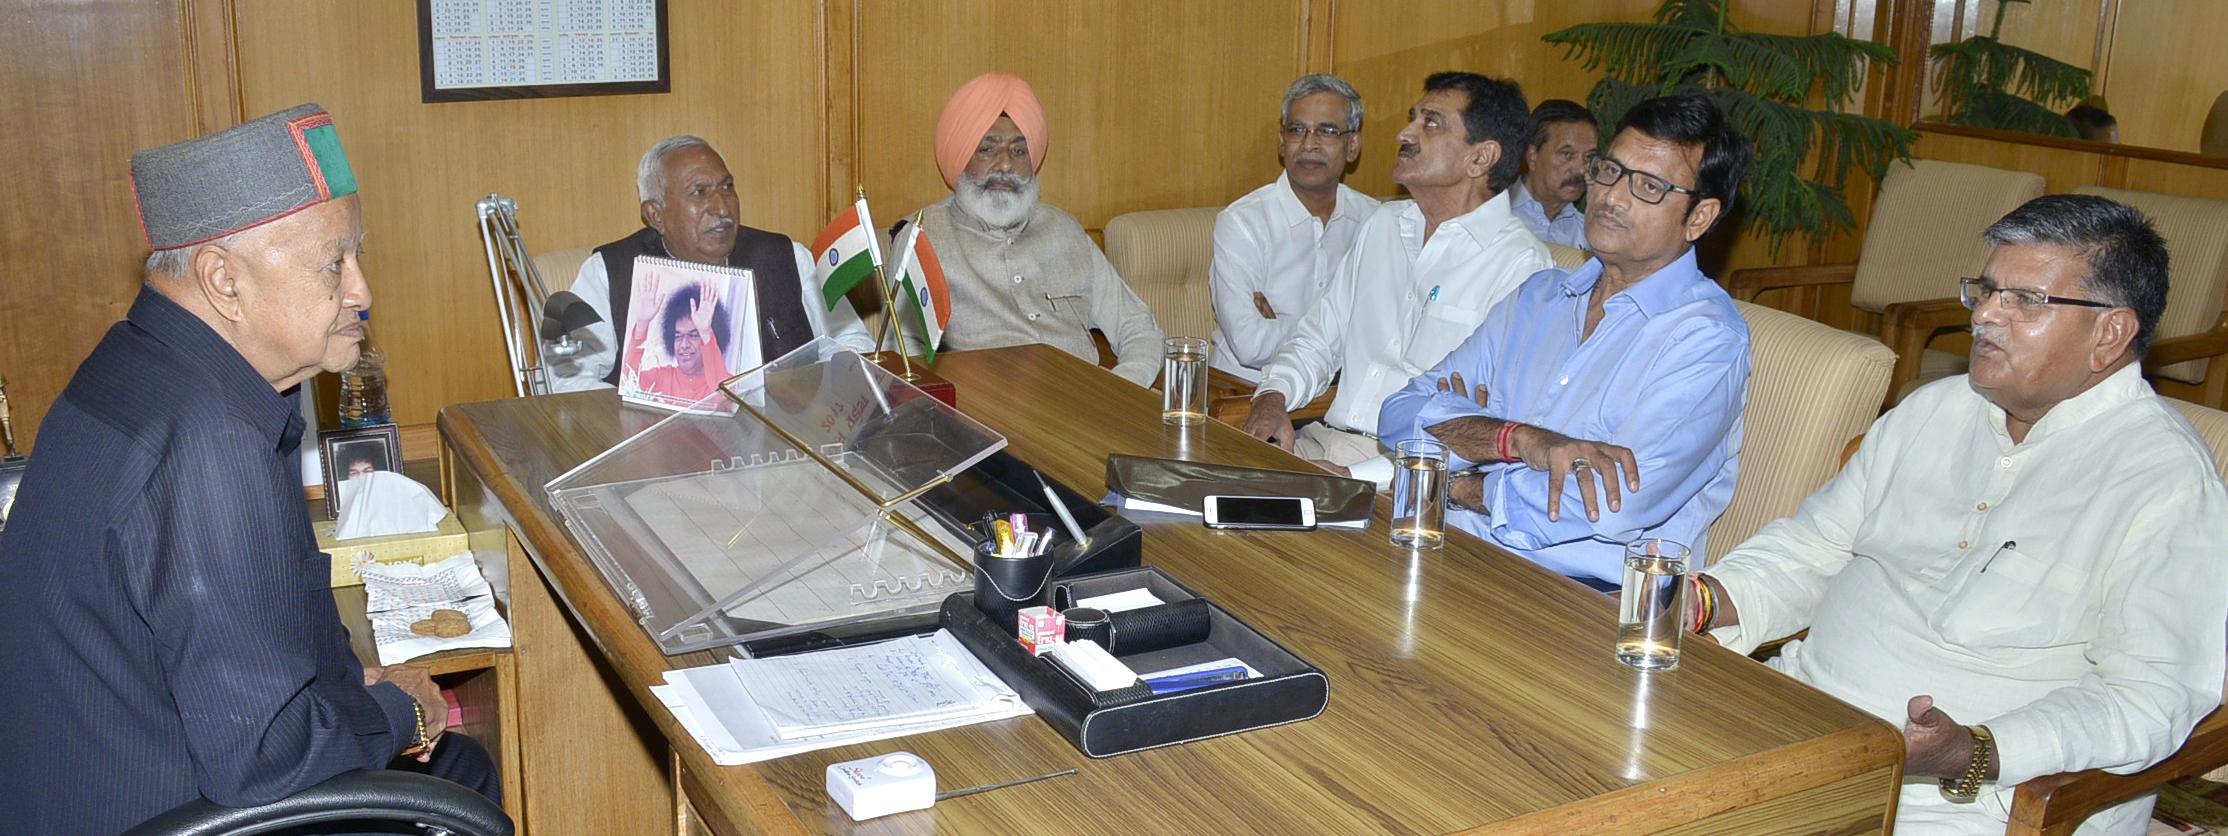 Meeting, Himachal Pradesh, Rajasthan, Government, Problem Solving